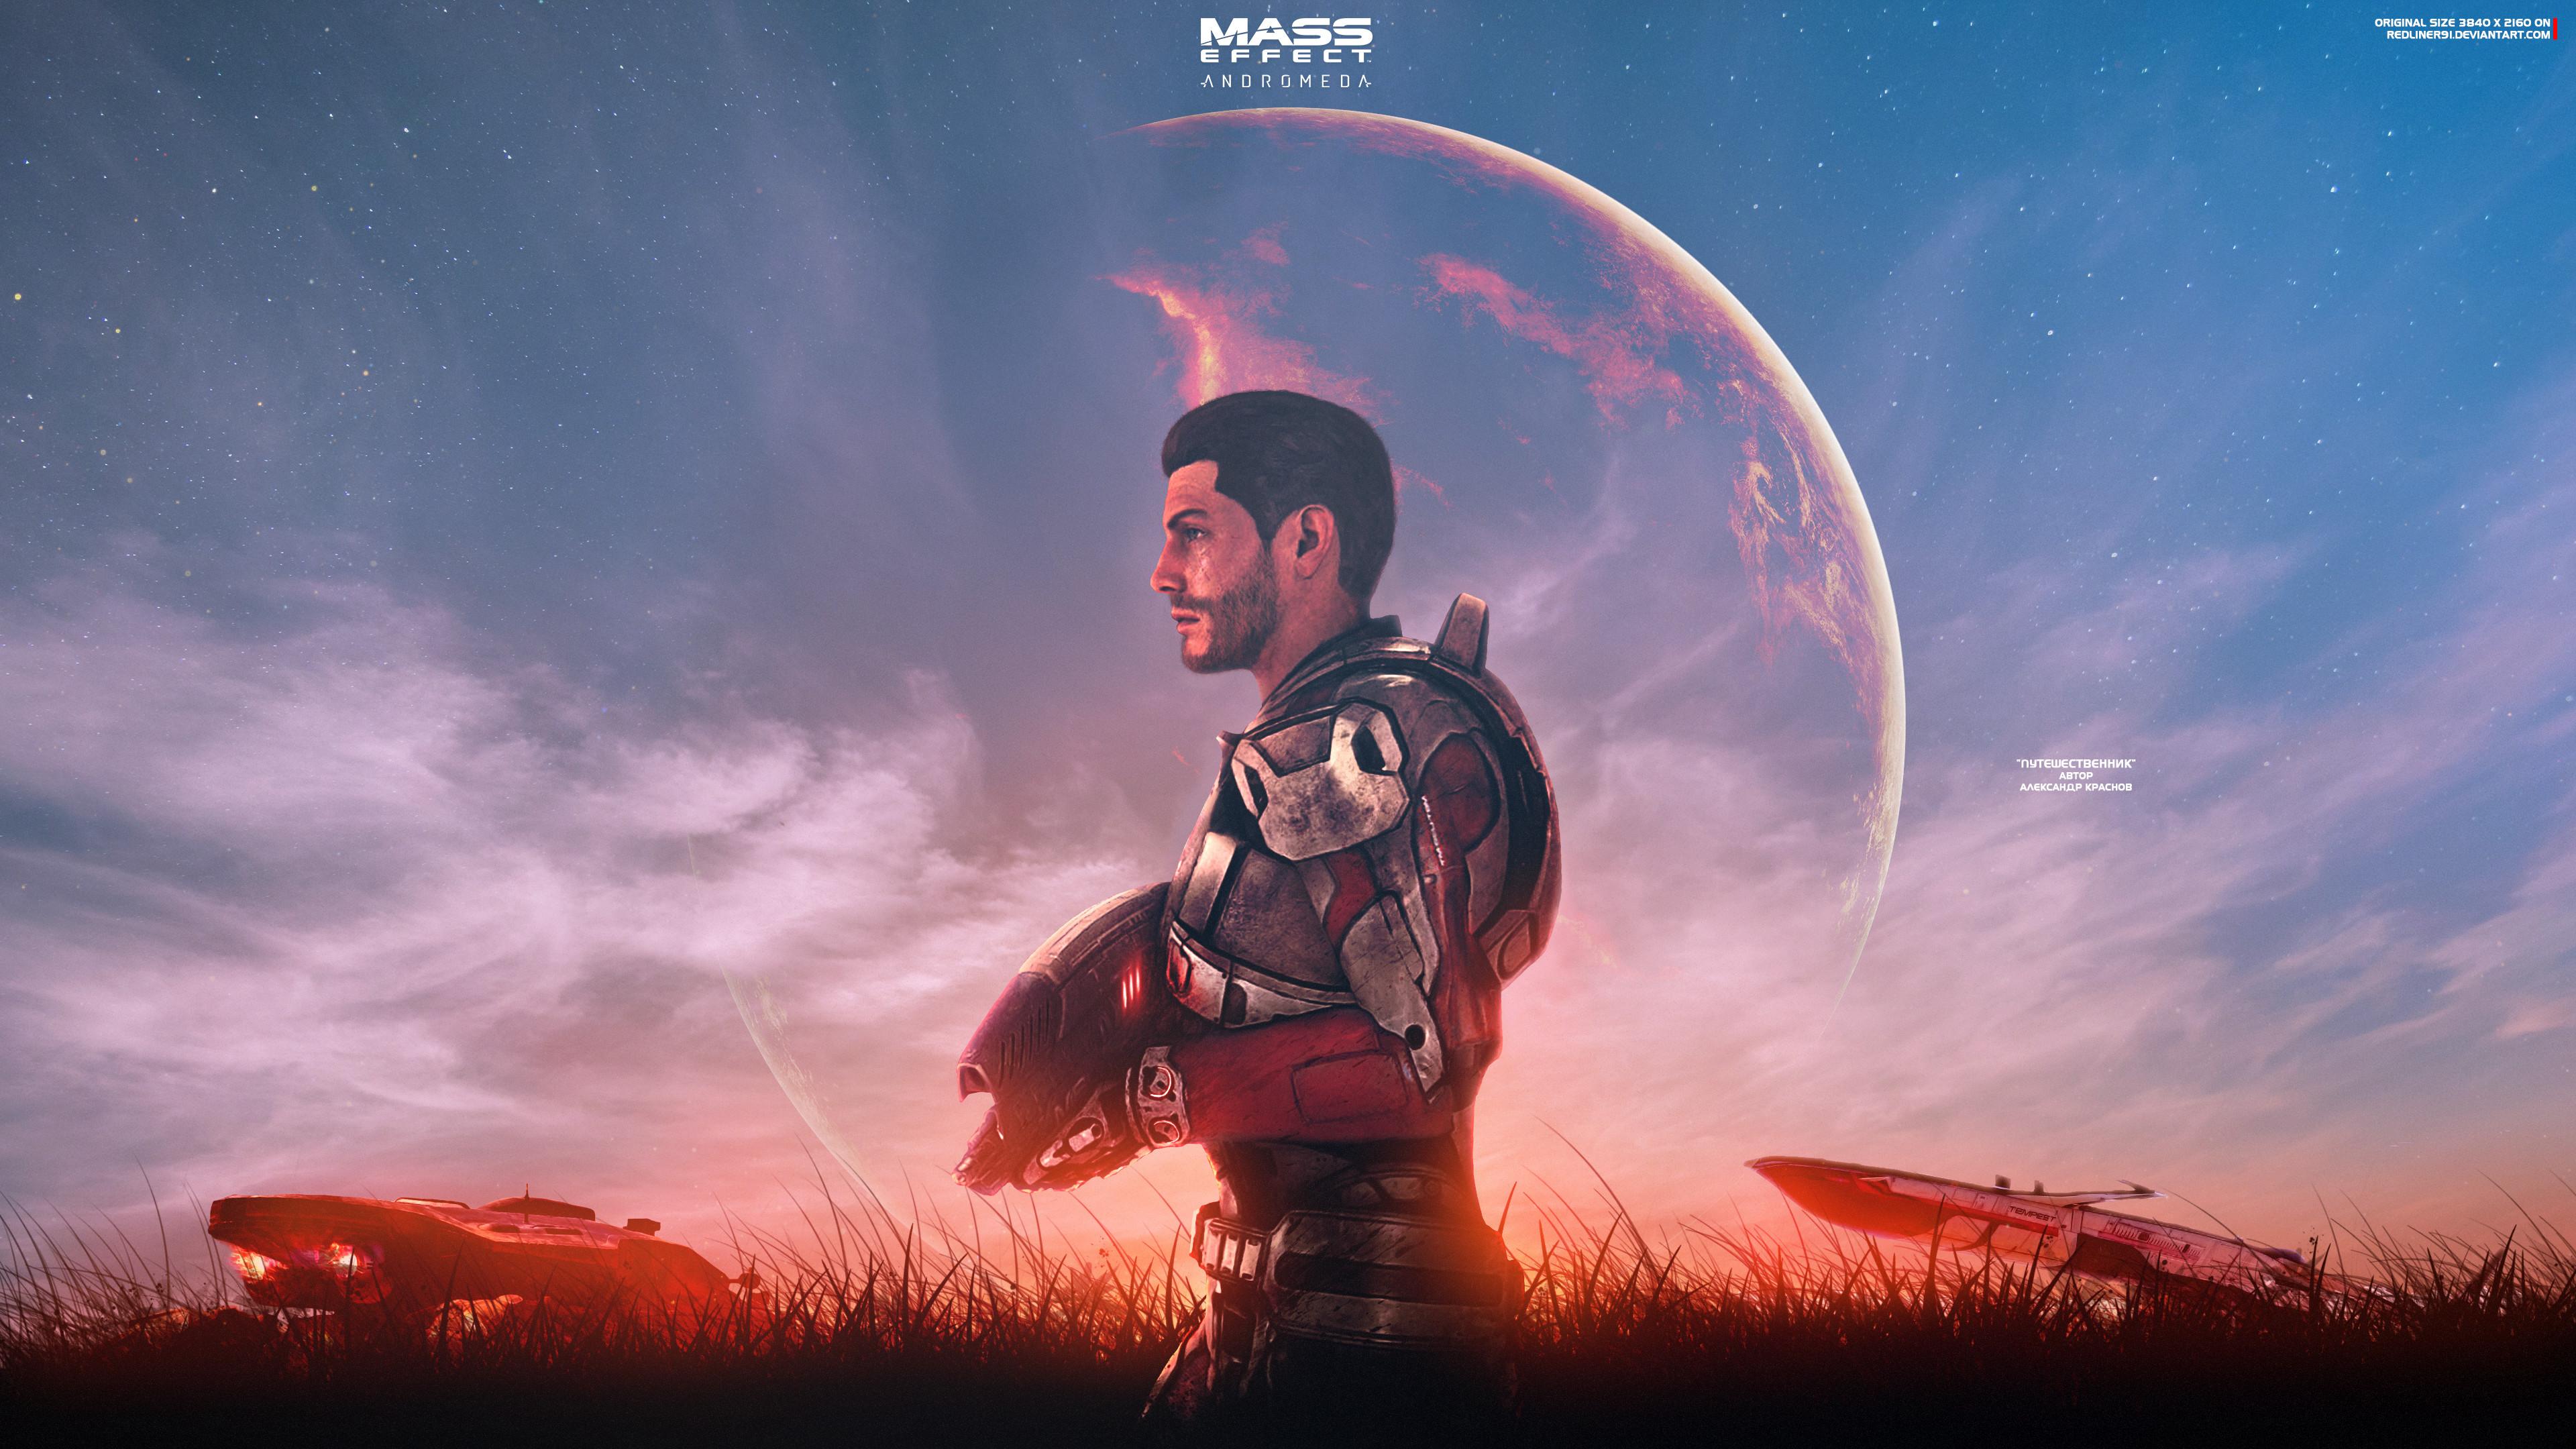 4k Mass Effect Wallpaper Posted By Ryan Mercado